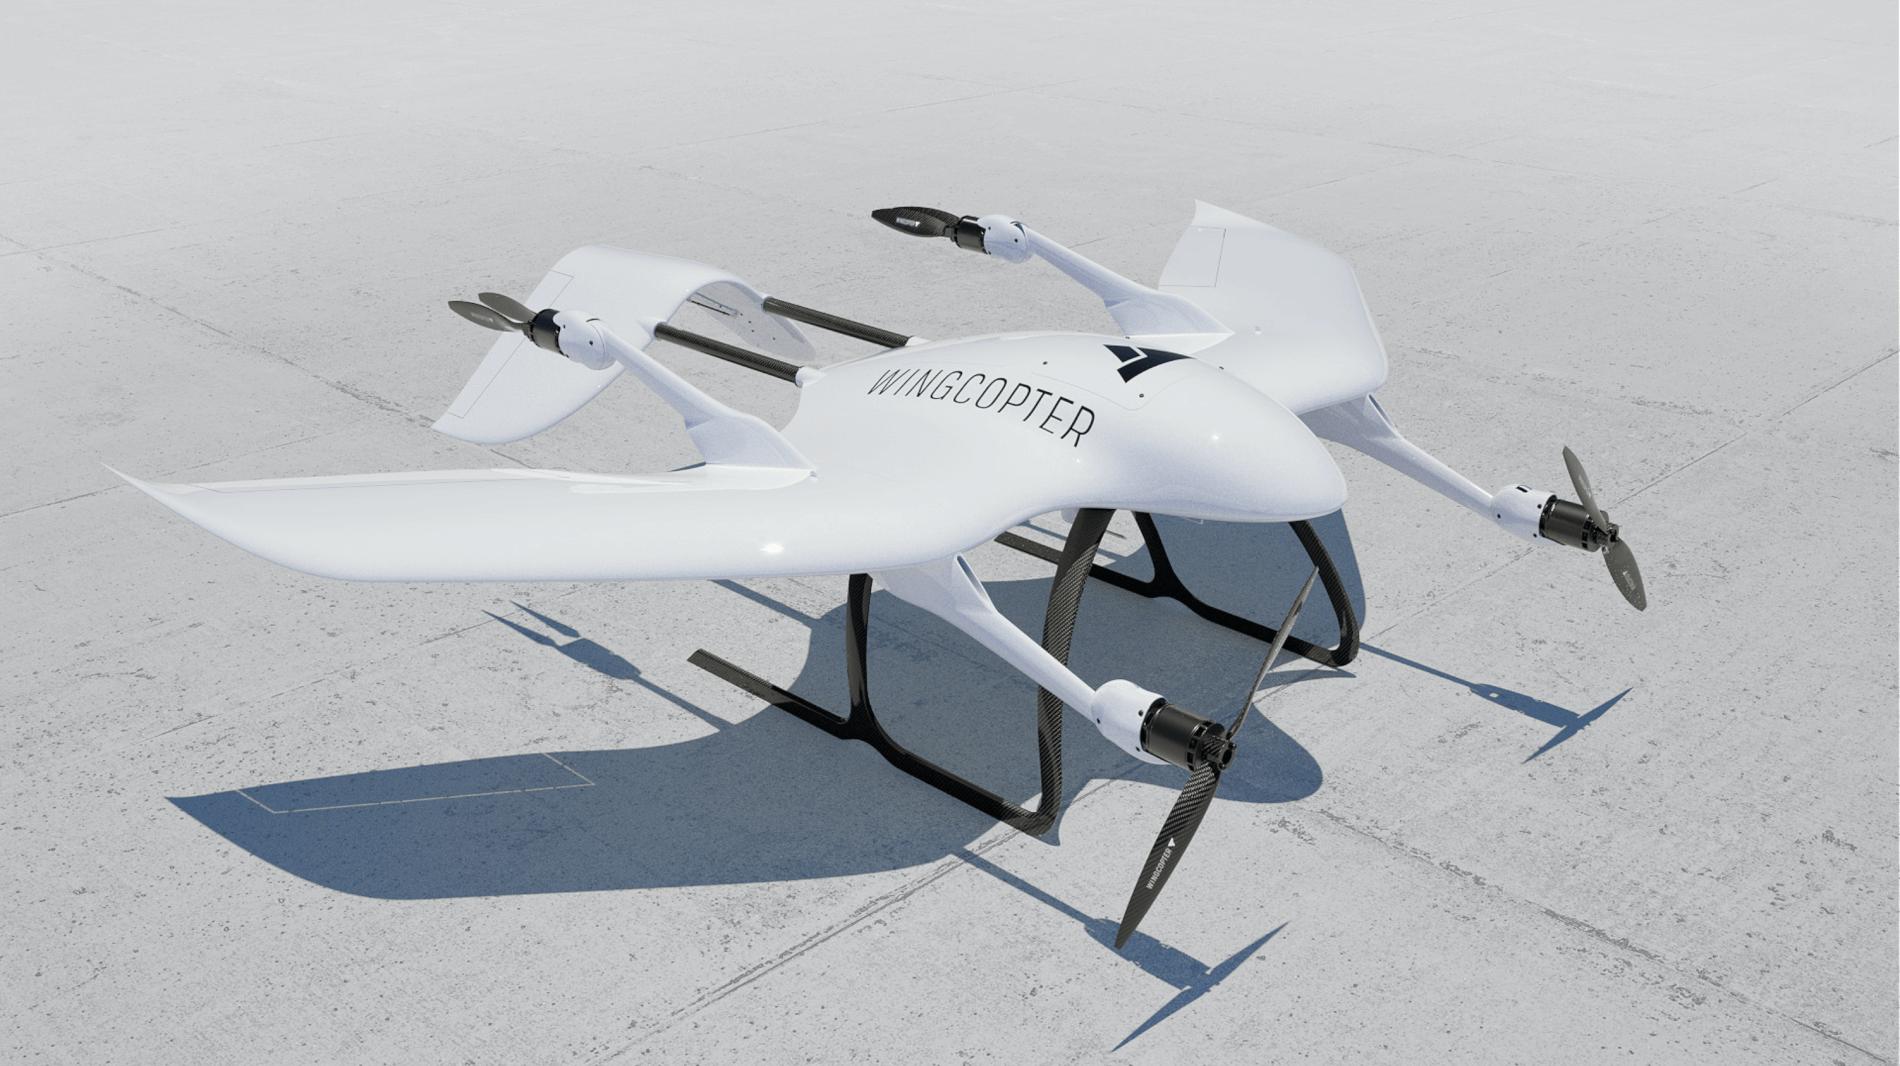 Logxon-wingcopter-vermessung-vtol-drohne-laser-survey-fixed-wing-abflugbereit-weiß-motoren-propeller-wing-copter